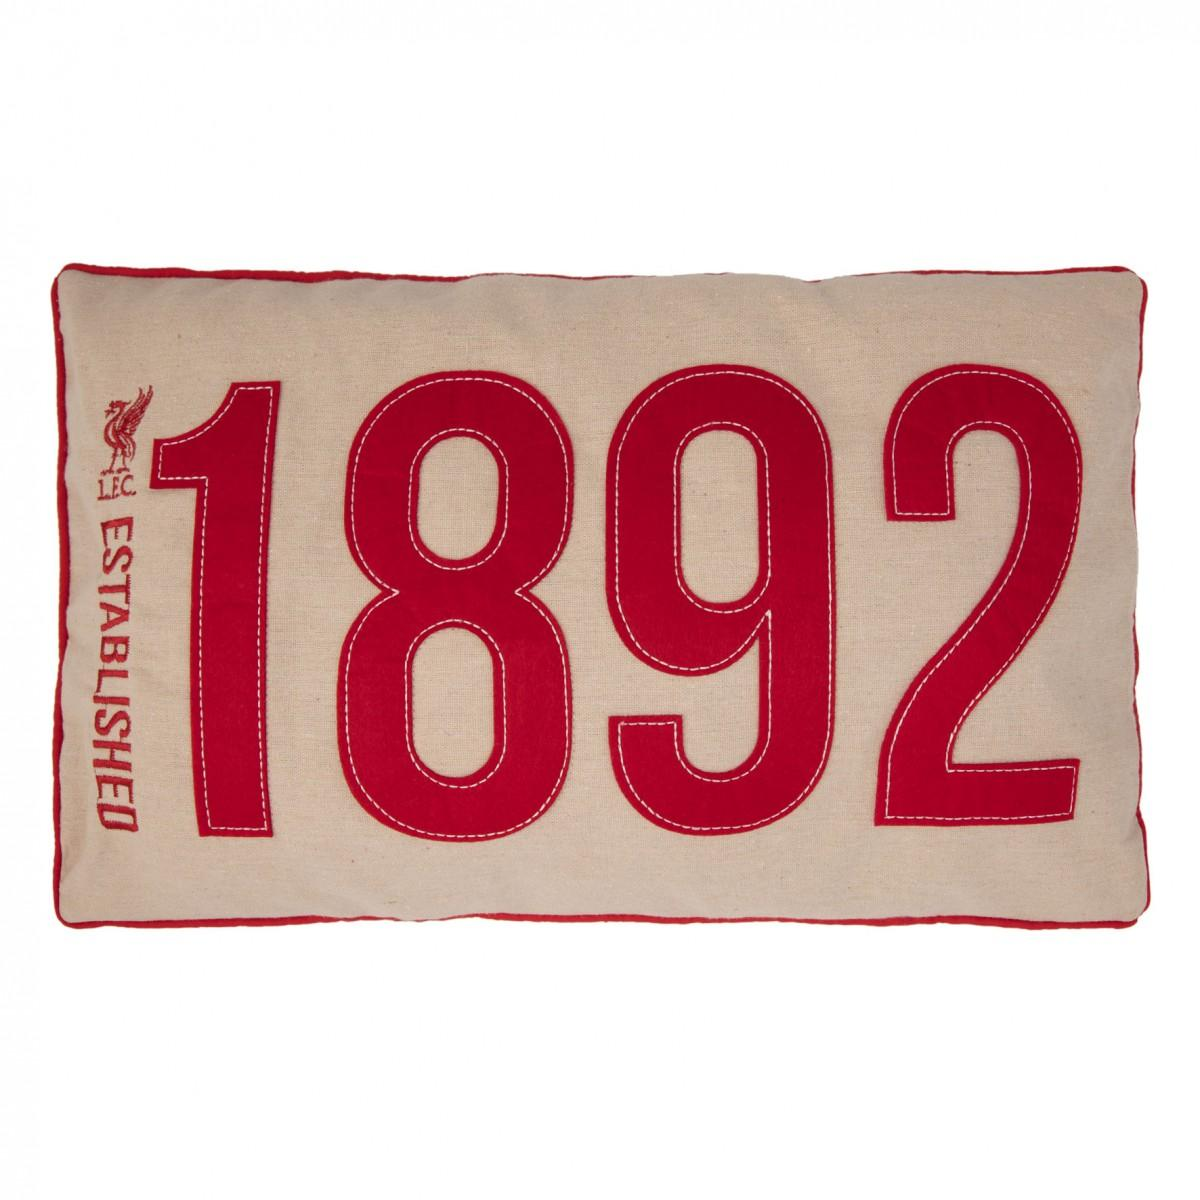 LIVERPOOL FC 1892 CUSHION